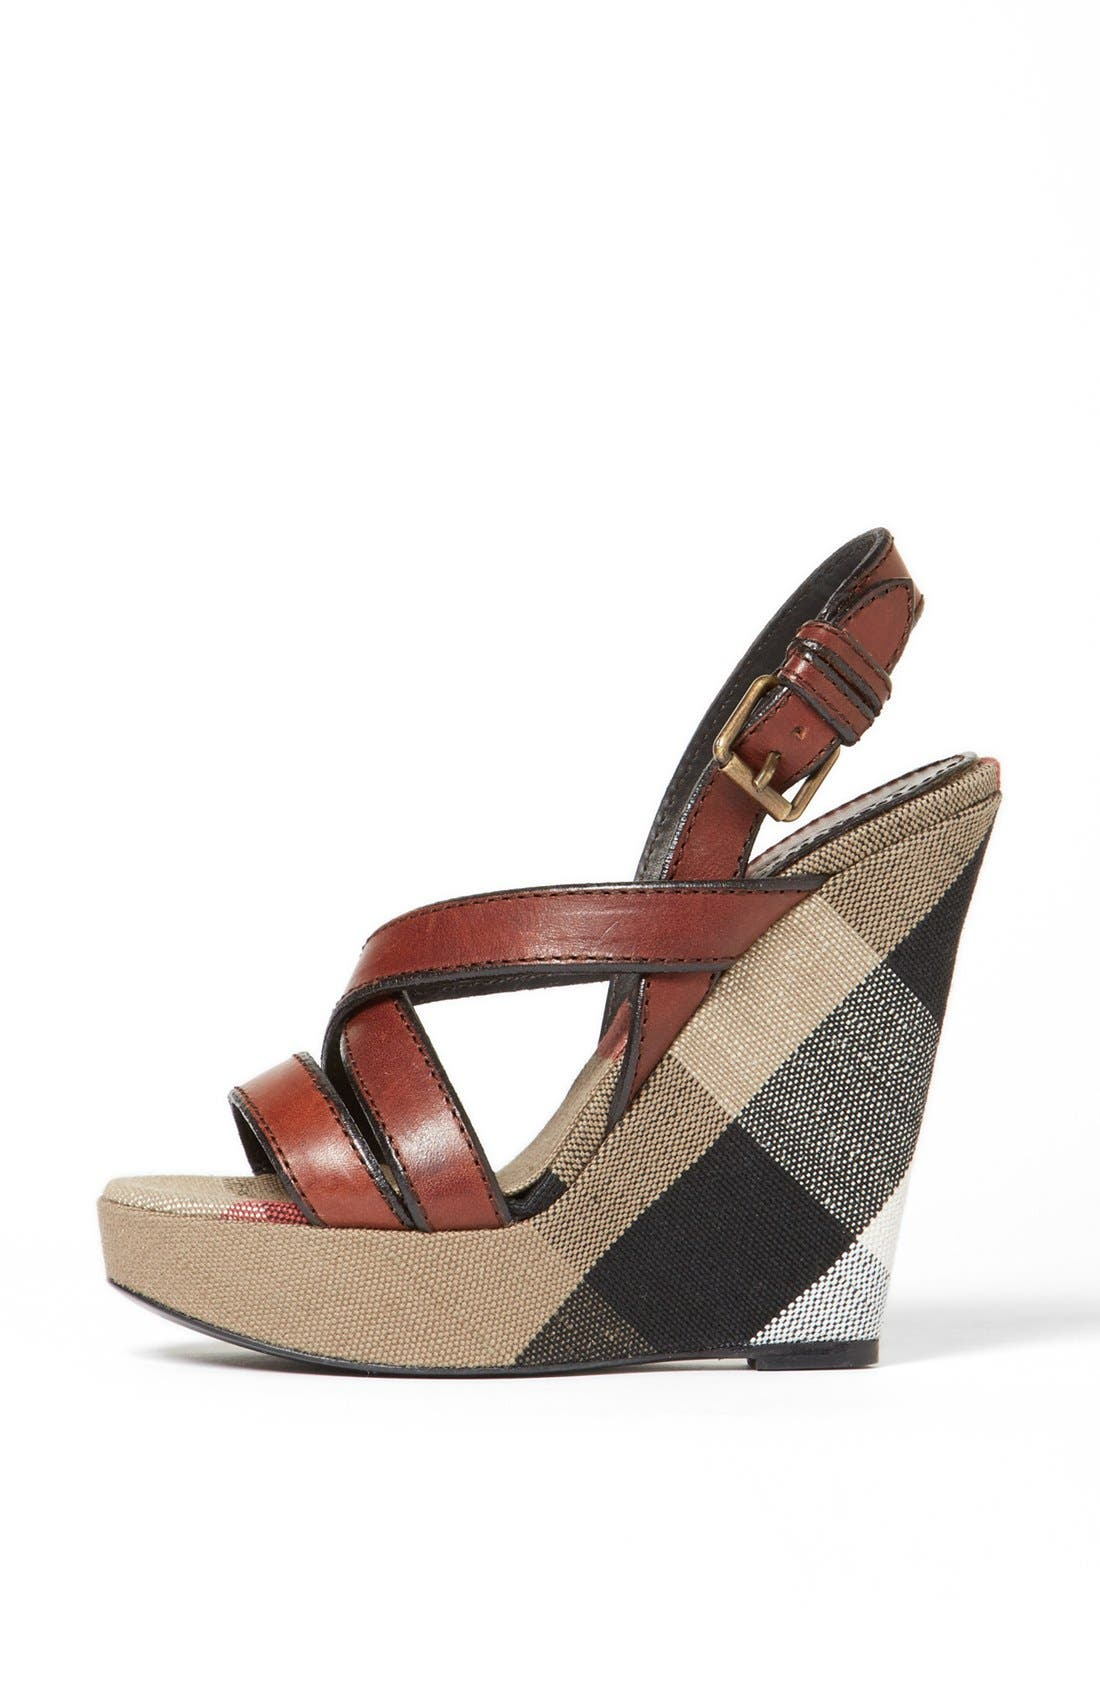 Alternate Image 3  - Burberry 'Warlow' Leather Sandal